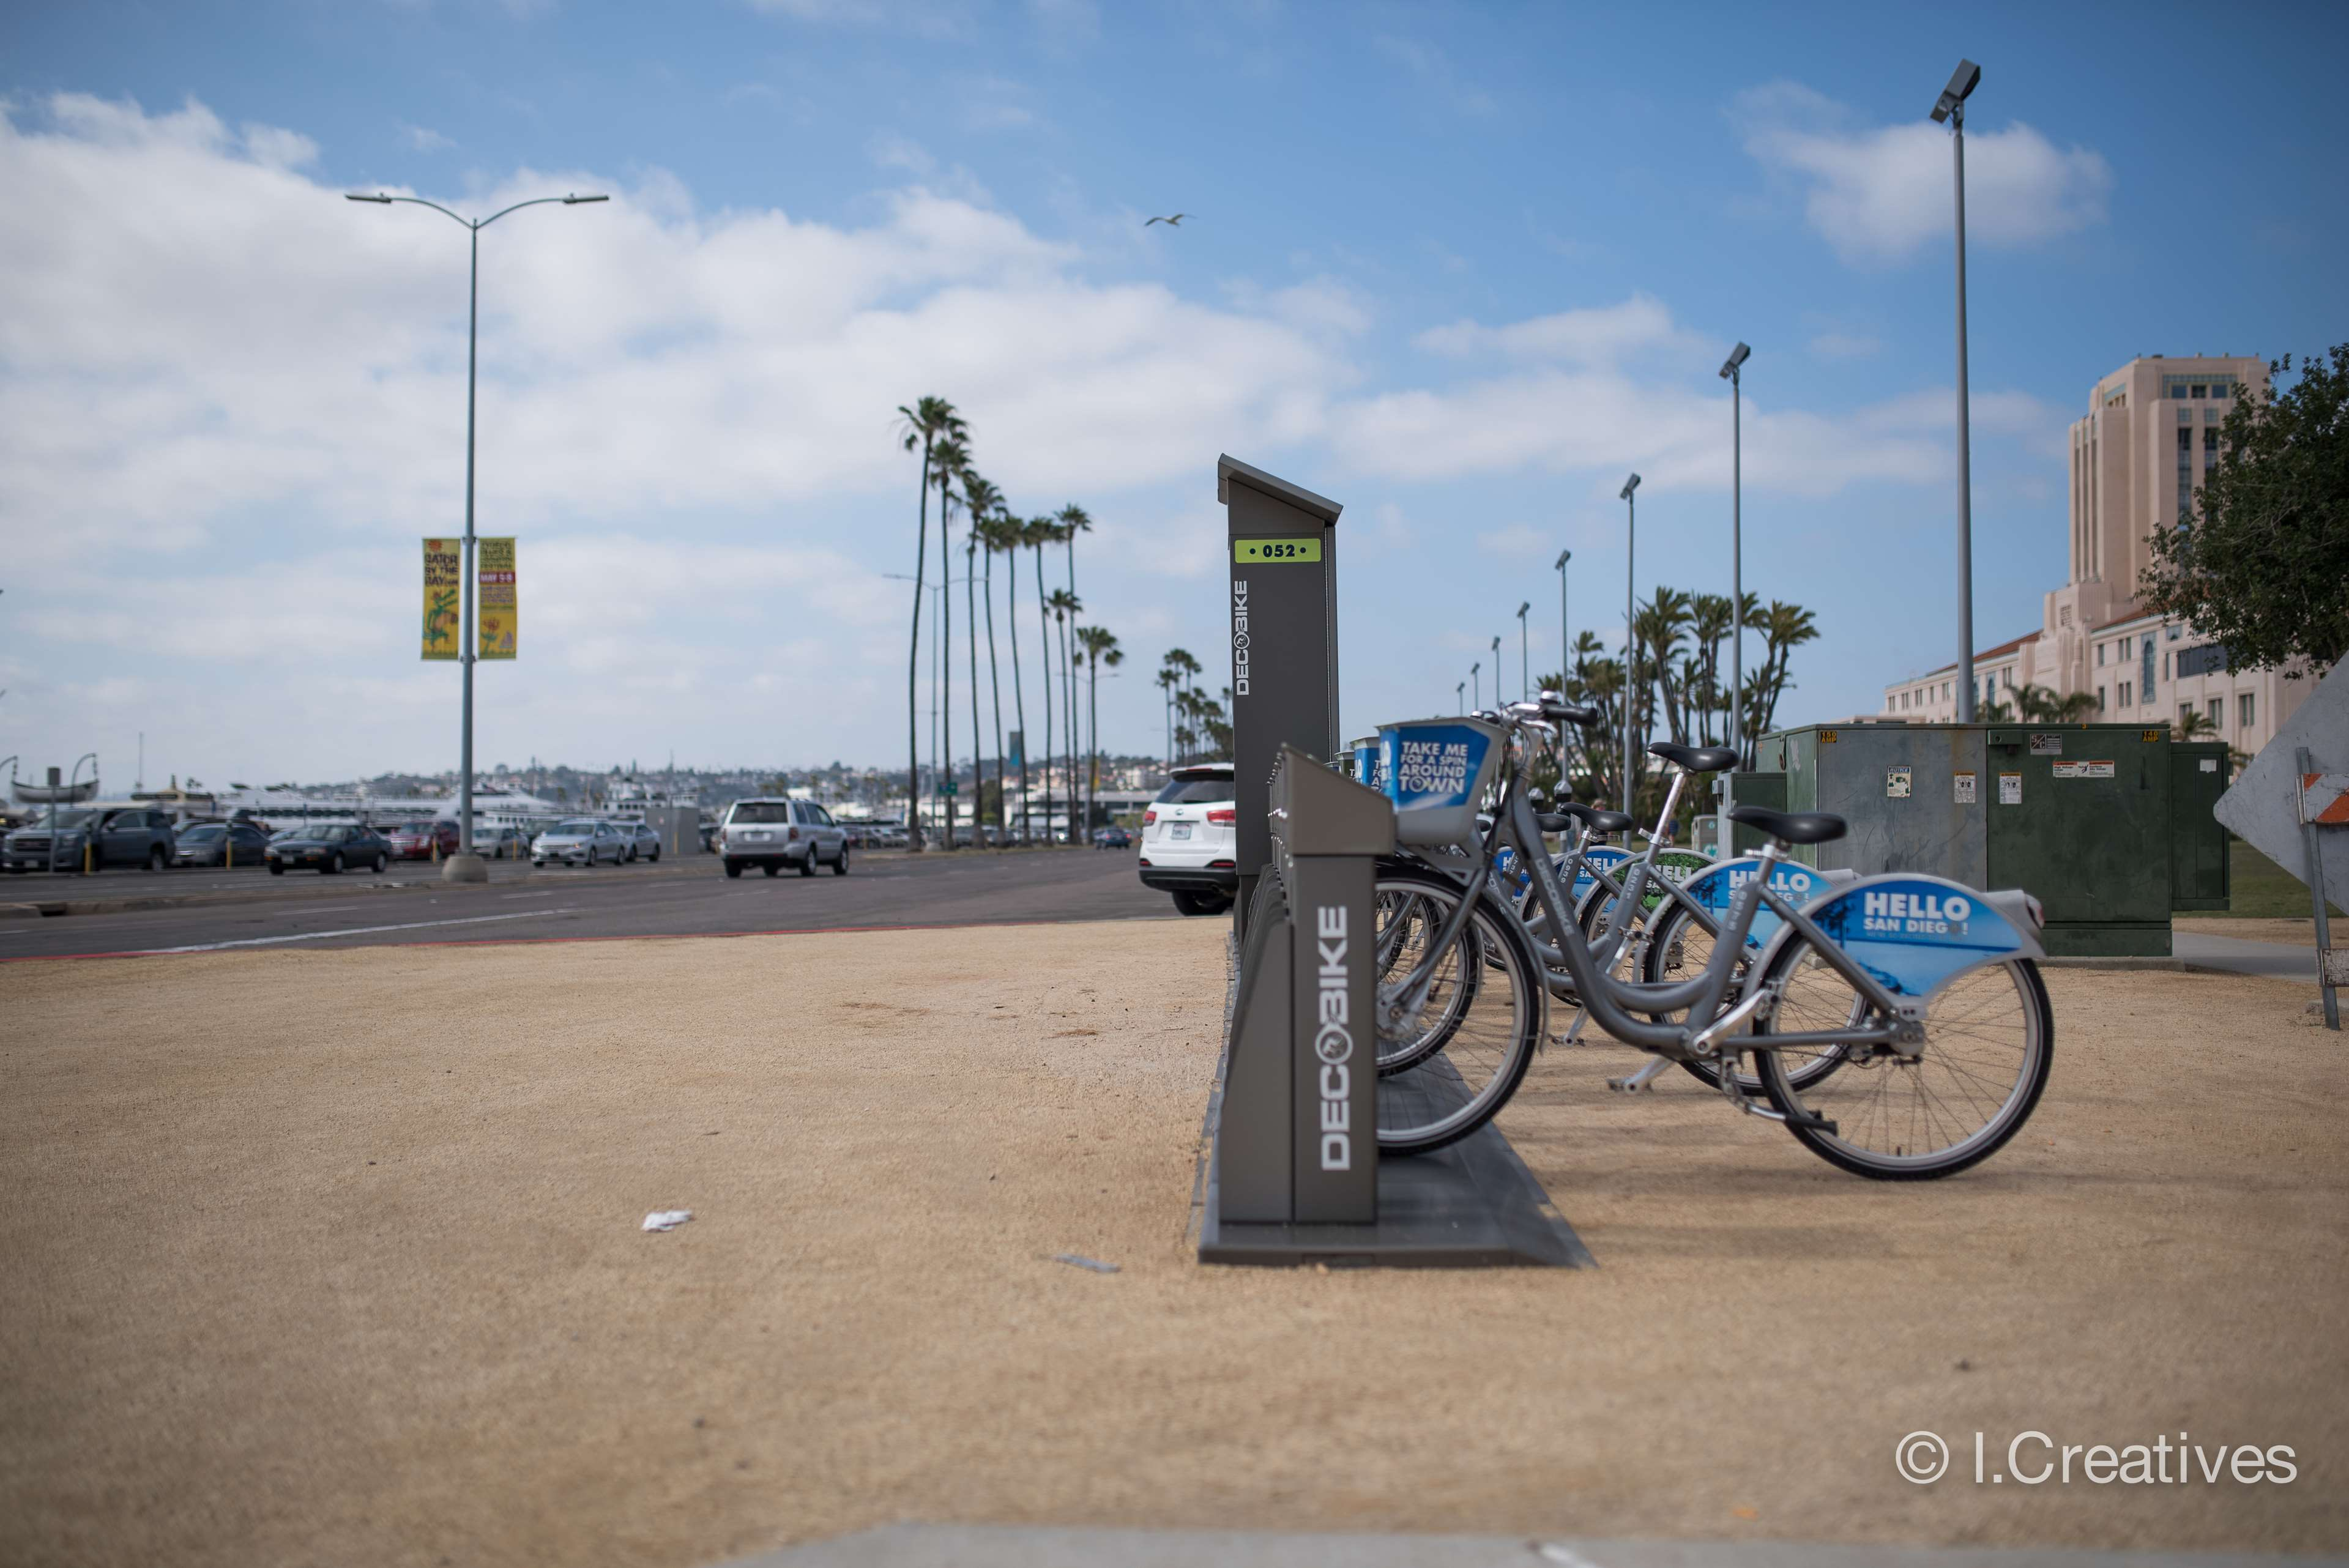 Local Bike Rental Stations